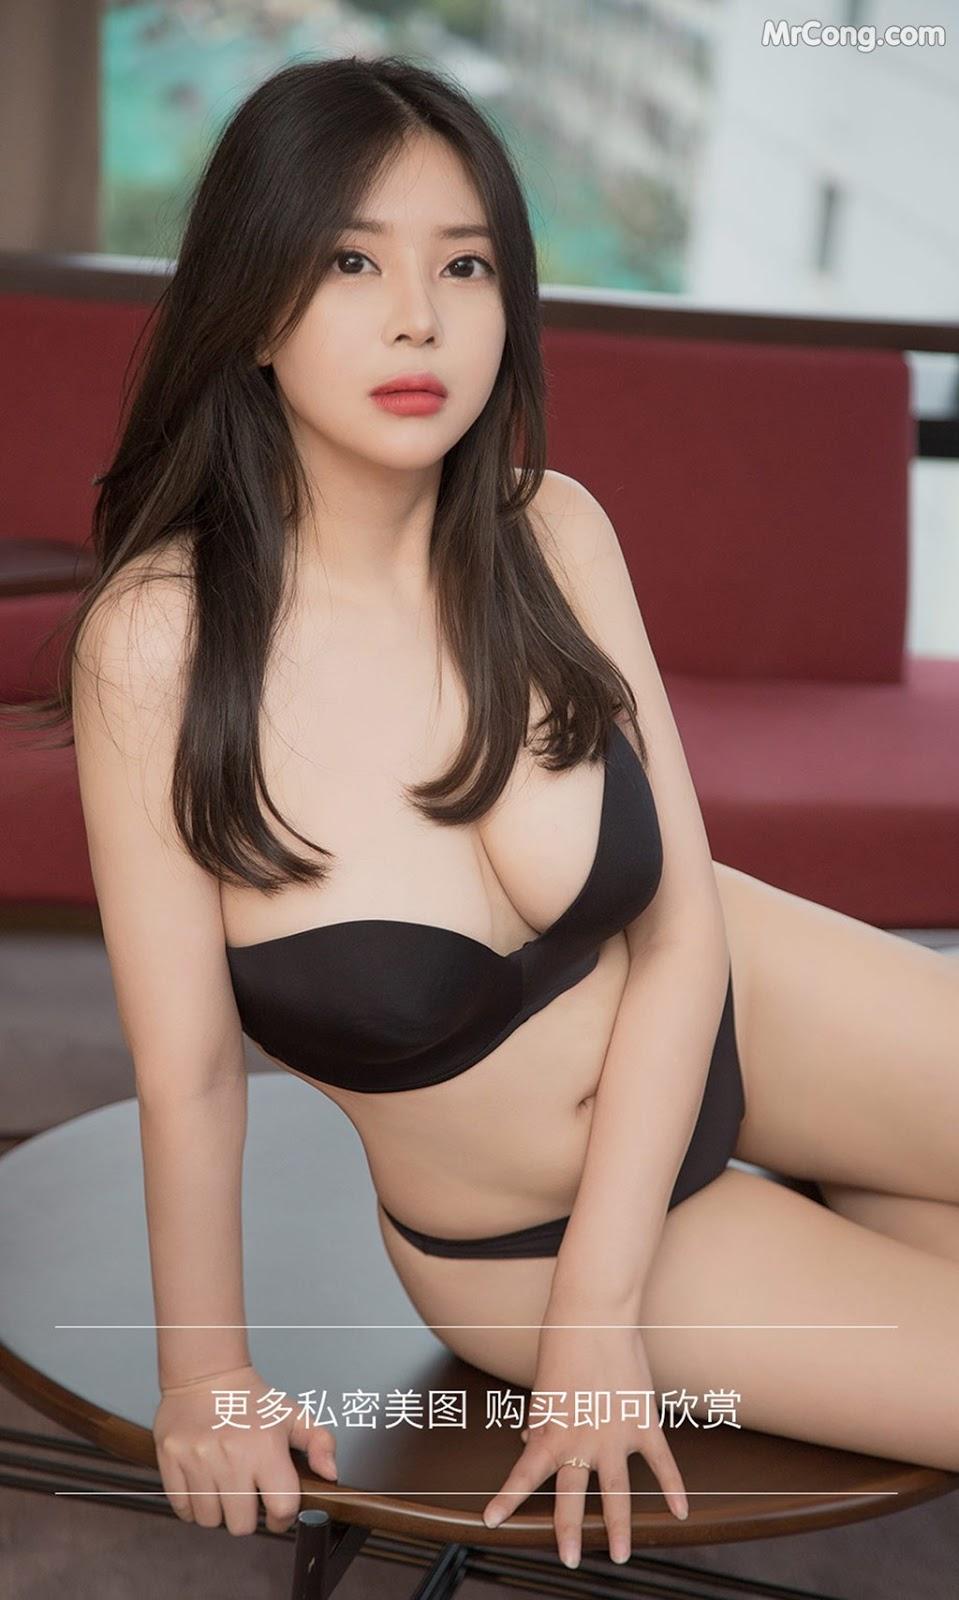 Image UGIRLS-Ai-You-Wu-App-No.1610-MrCong.com-015 in post UGIRLS – Ai You Wu App No.1610: 之遥 (34 ảnh)